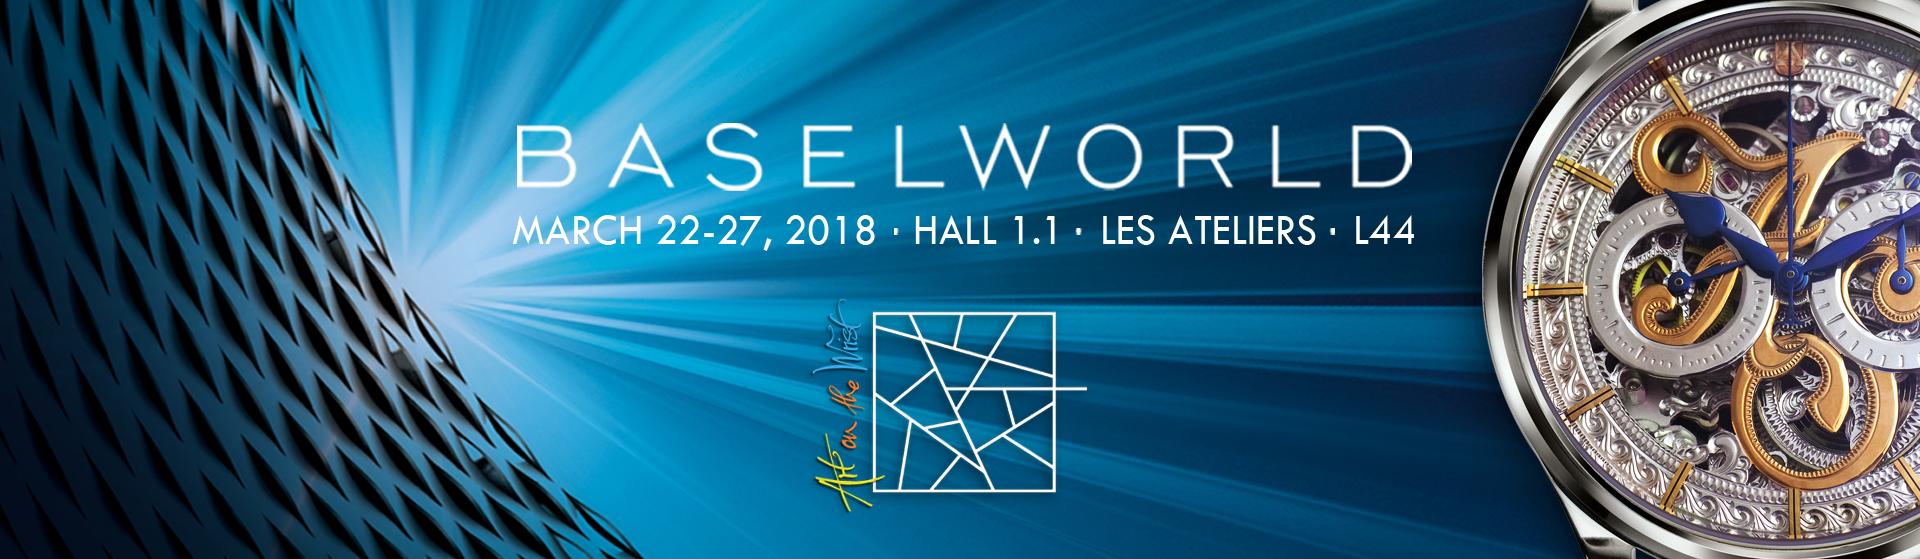 baselworld 2018 alexander shorokhoff